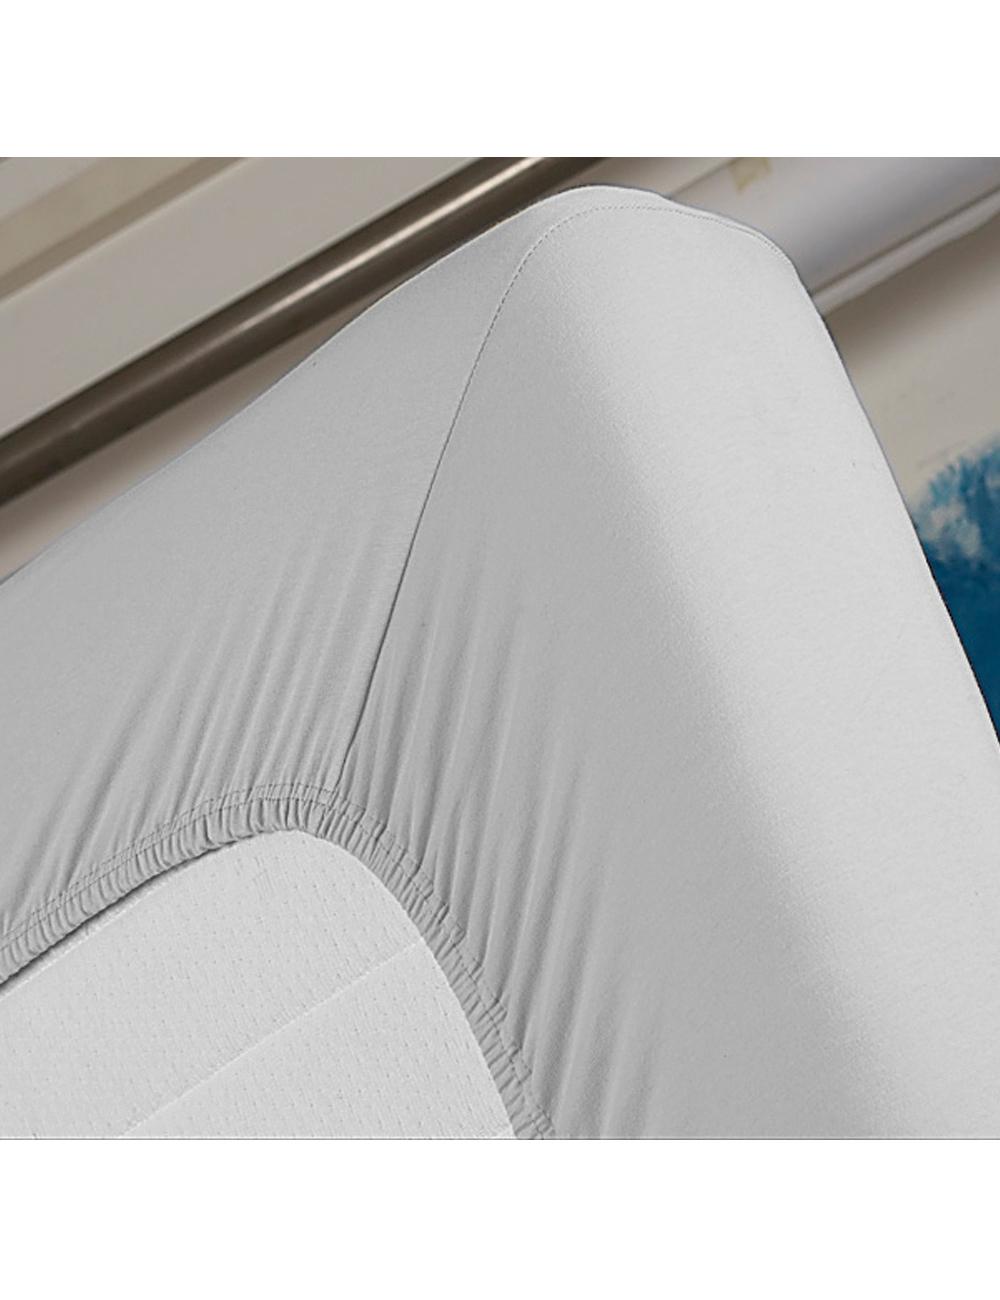 drap housse ponge stretch 90 x 200 gris. Black Bedroom Furniture Sets. Home Design Ideas